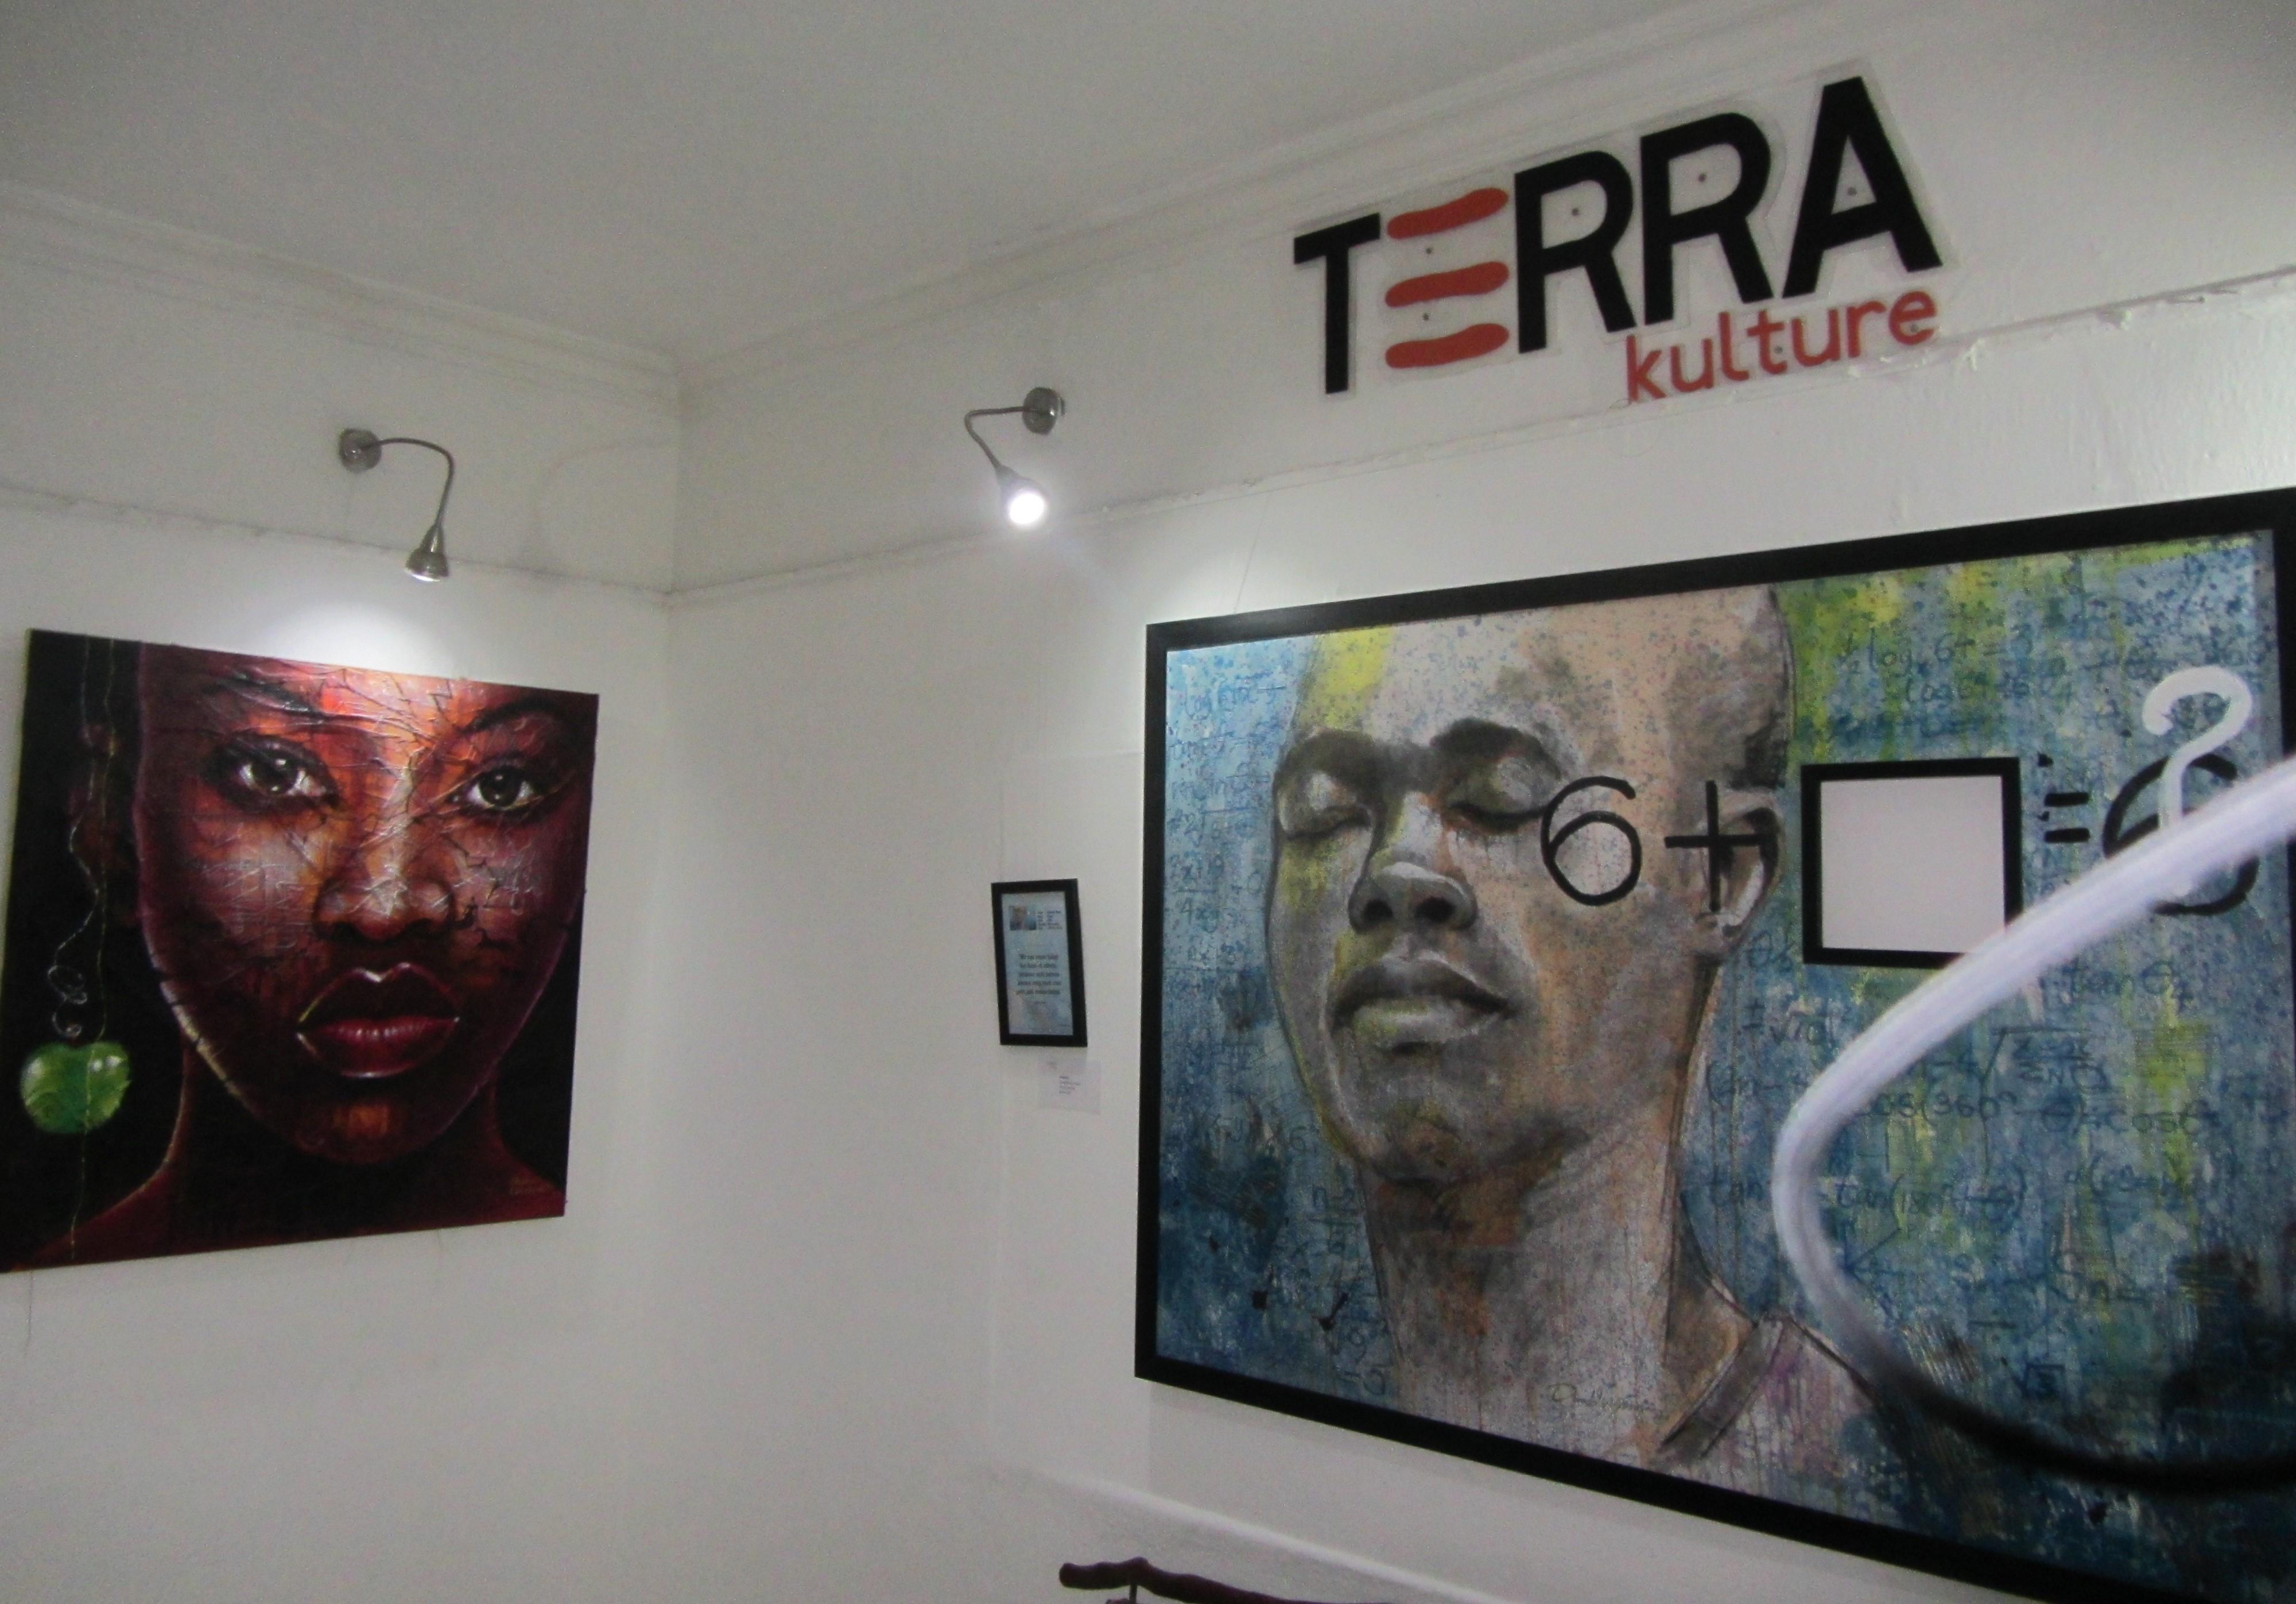 Terra Kulture